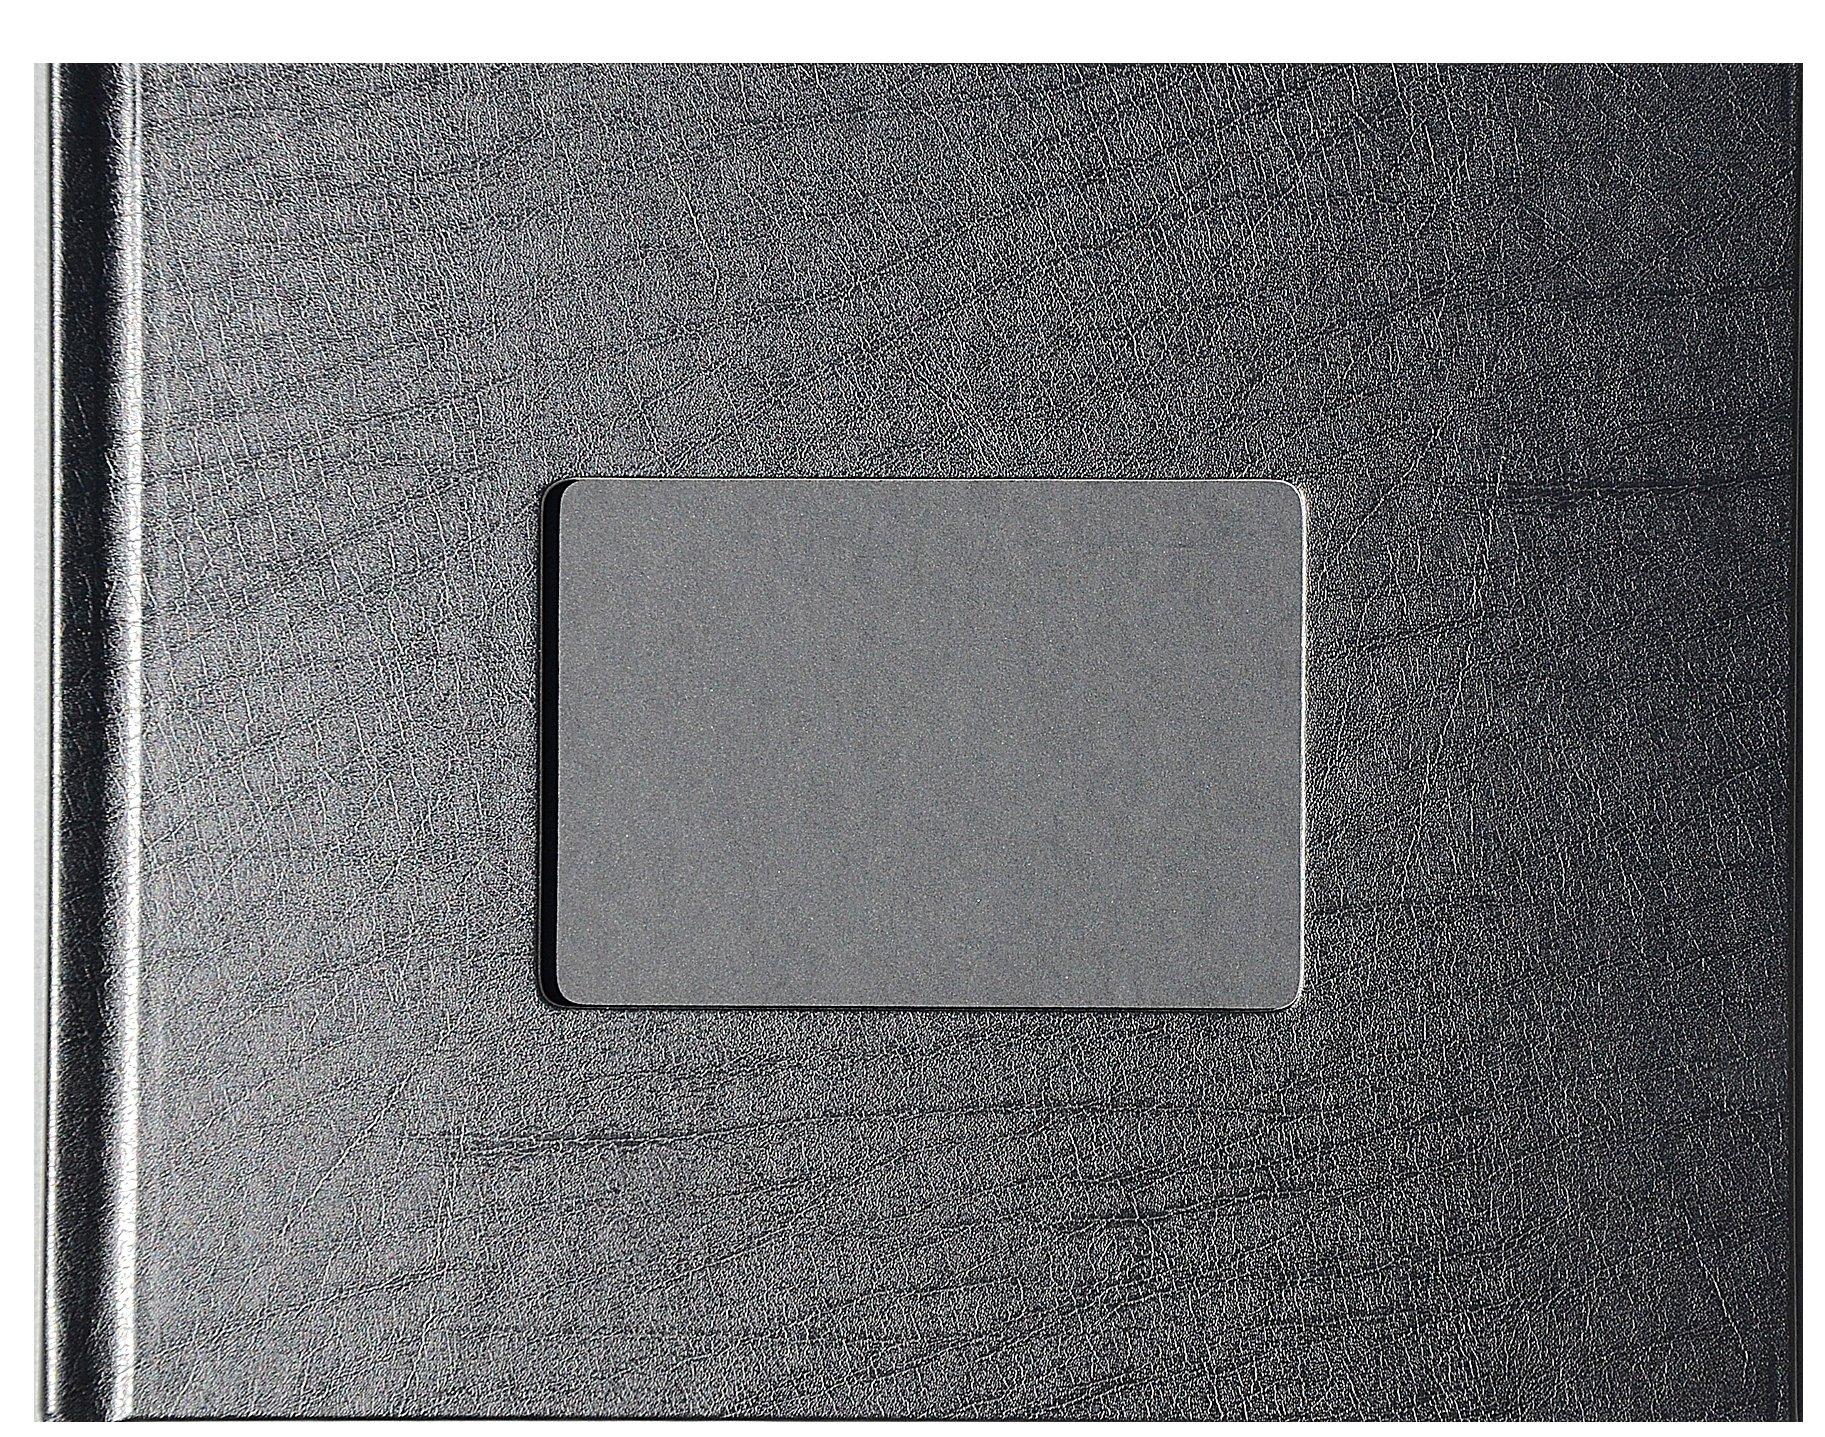 "Unibind 259FD8BA3DF 3mm Black Leatherette 8.5"" x 11"" Photobook - 10 Pack"